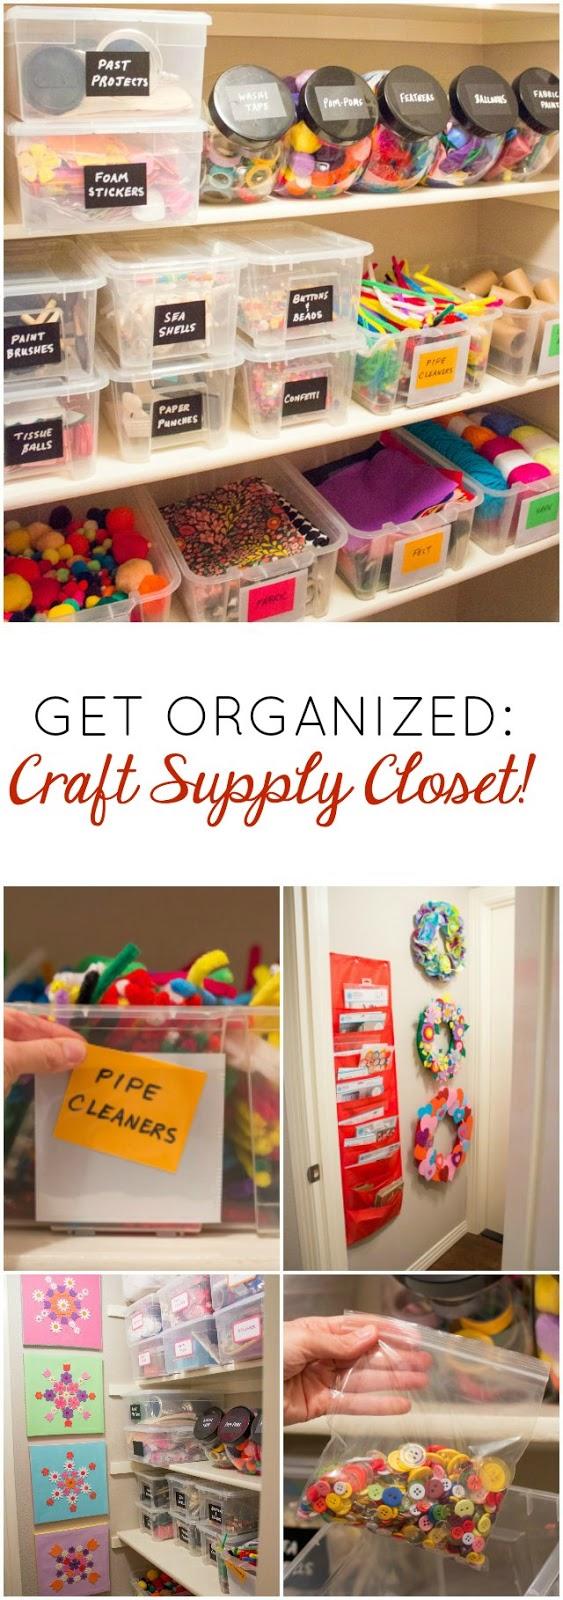 Love this organized craft supply closet!!